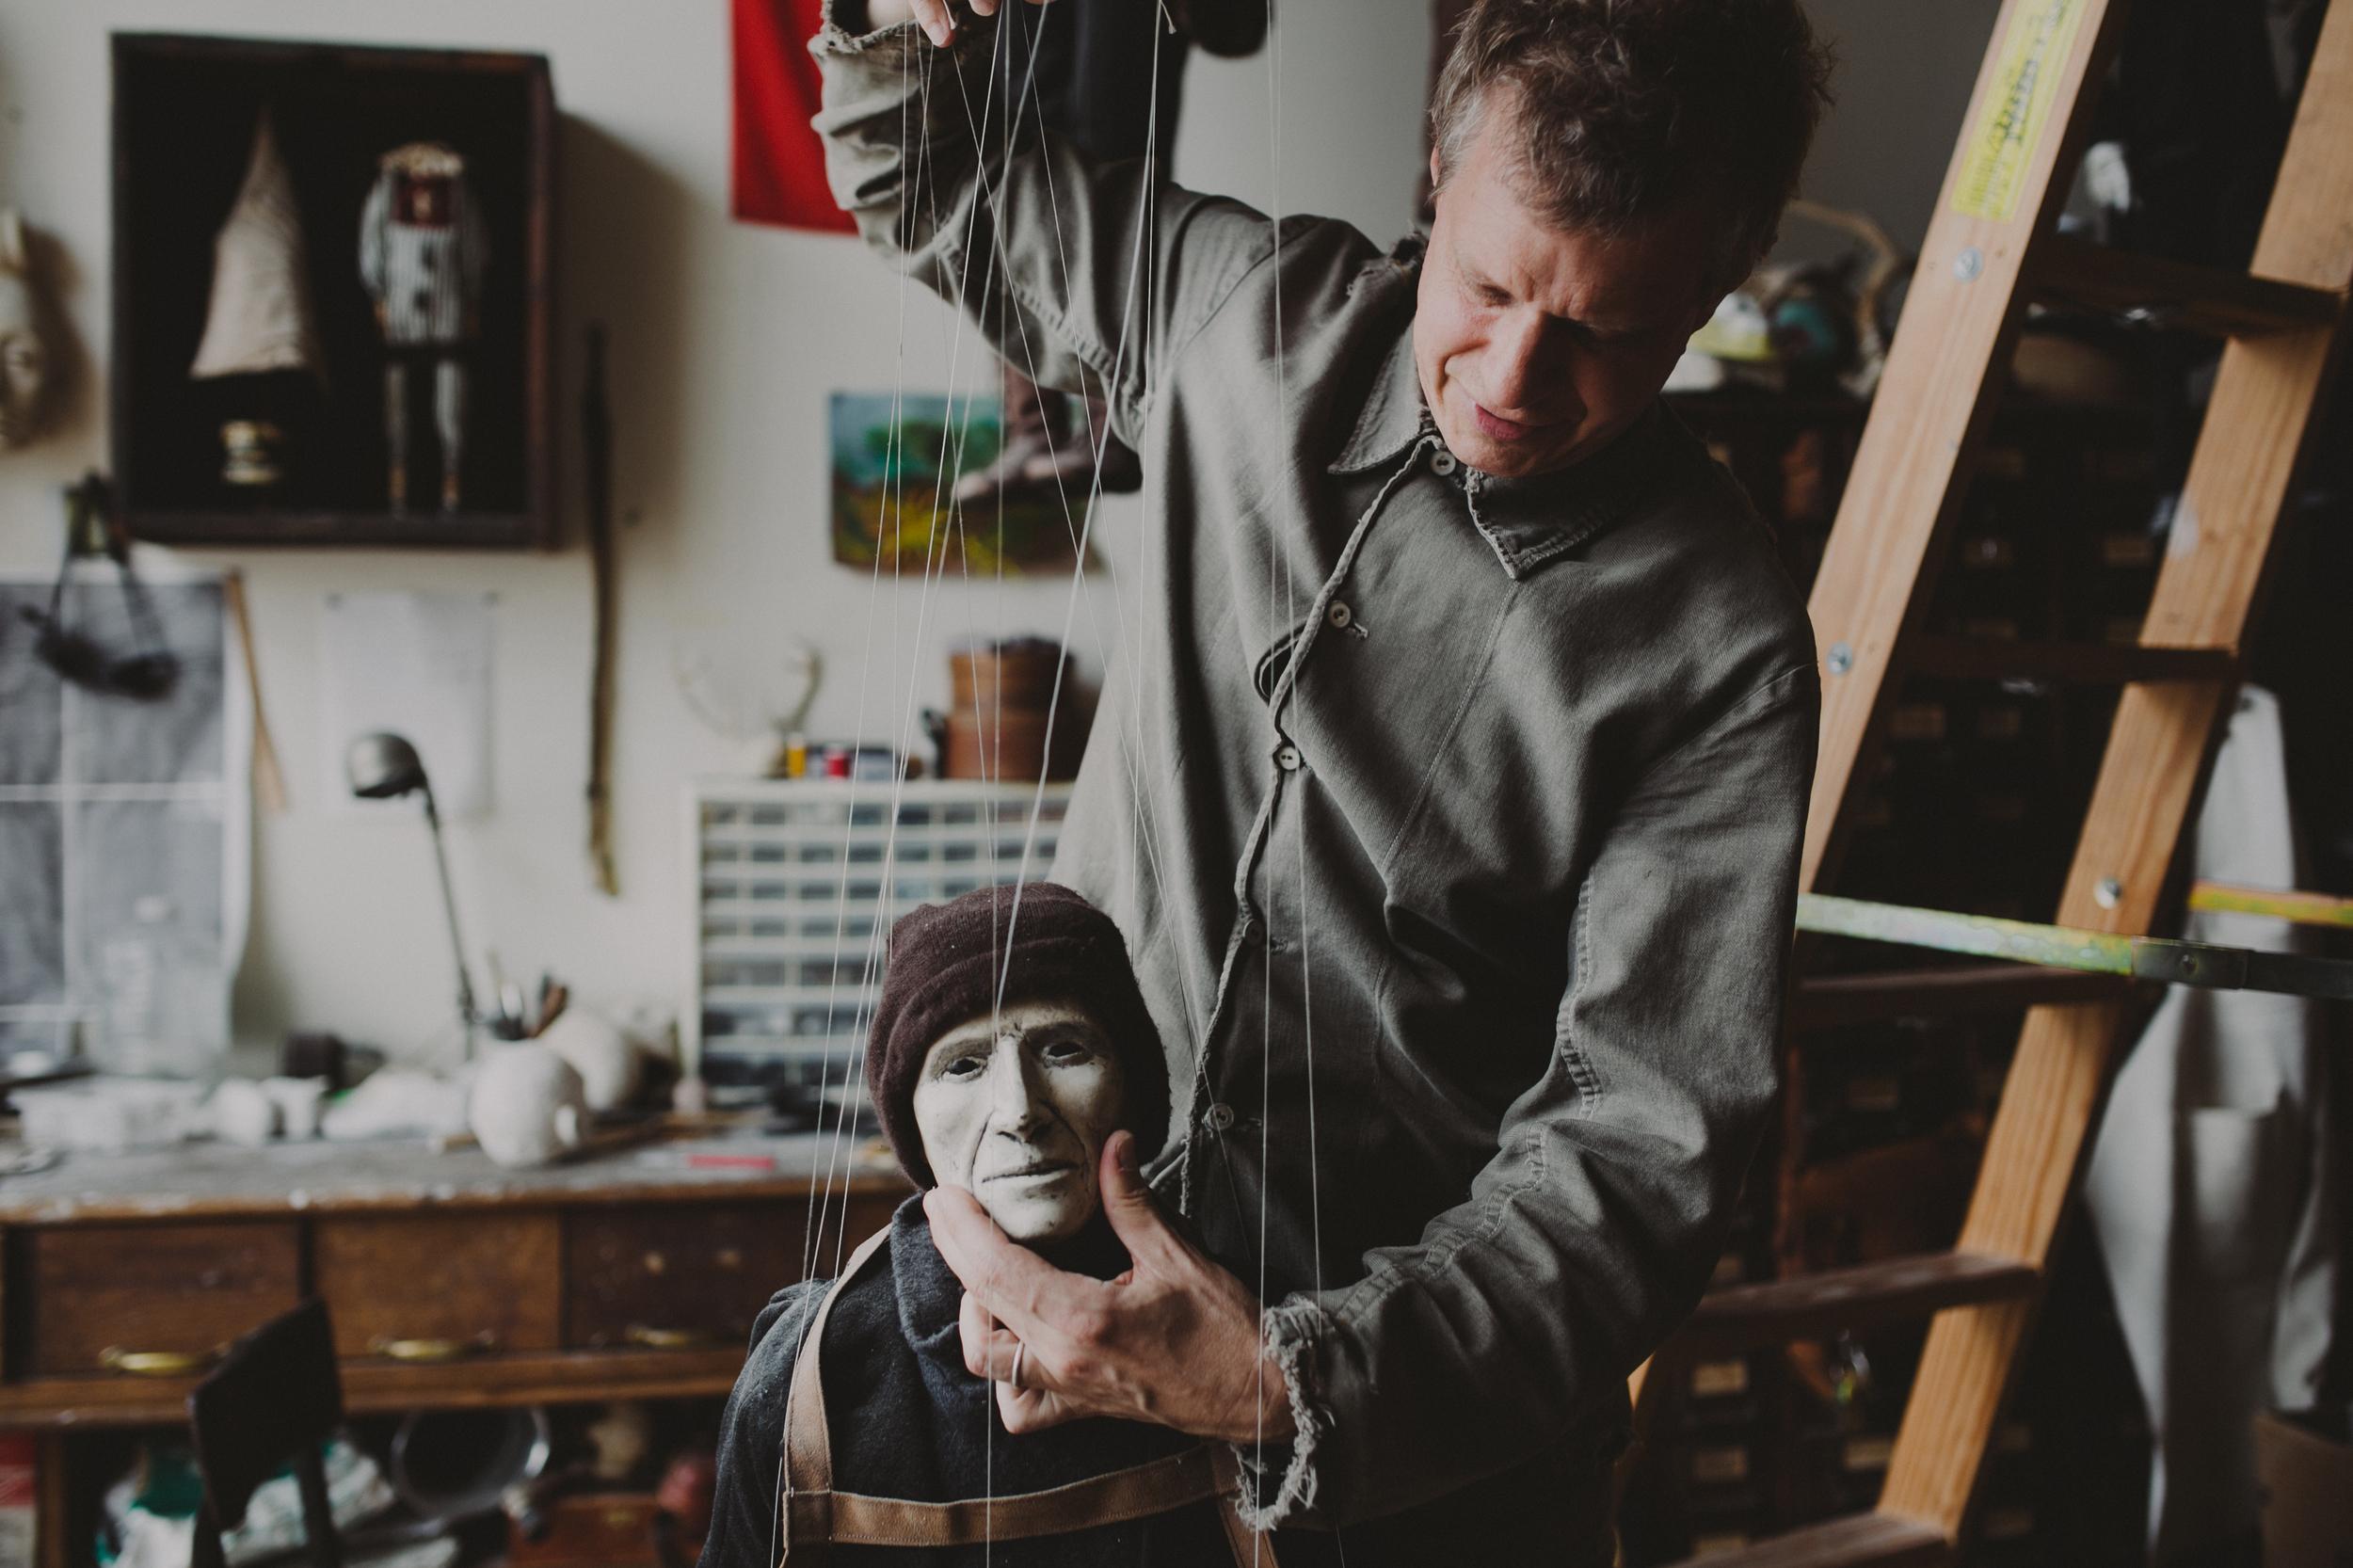 bogart portraits meet the michaels phantom limb 1951.JPG